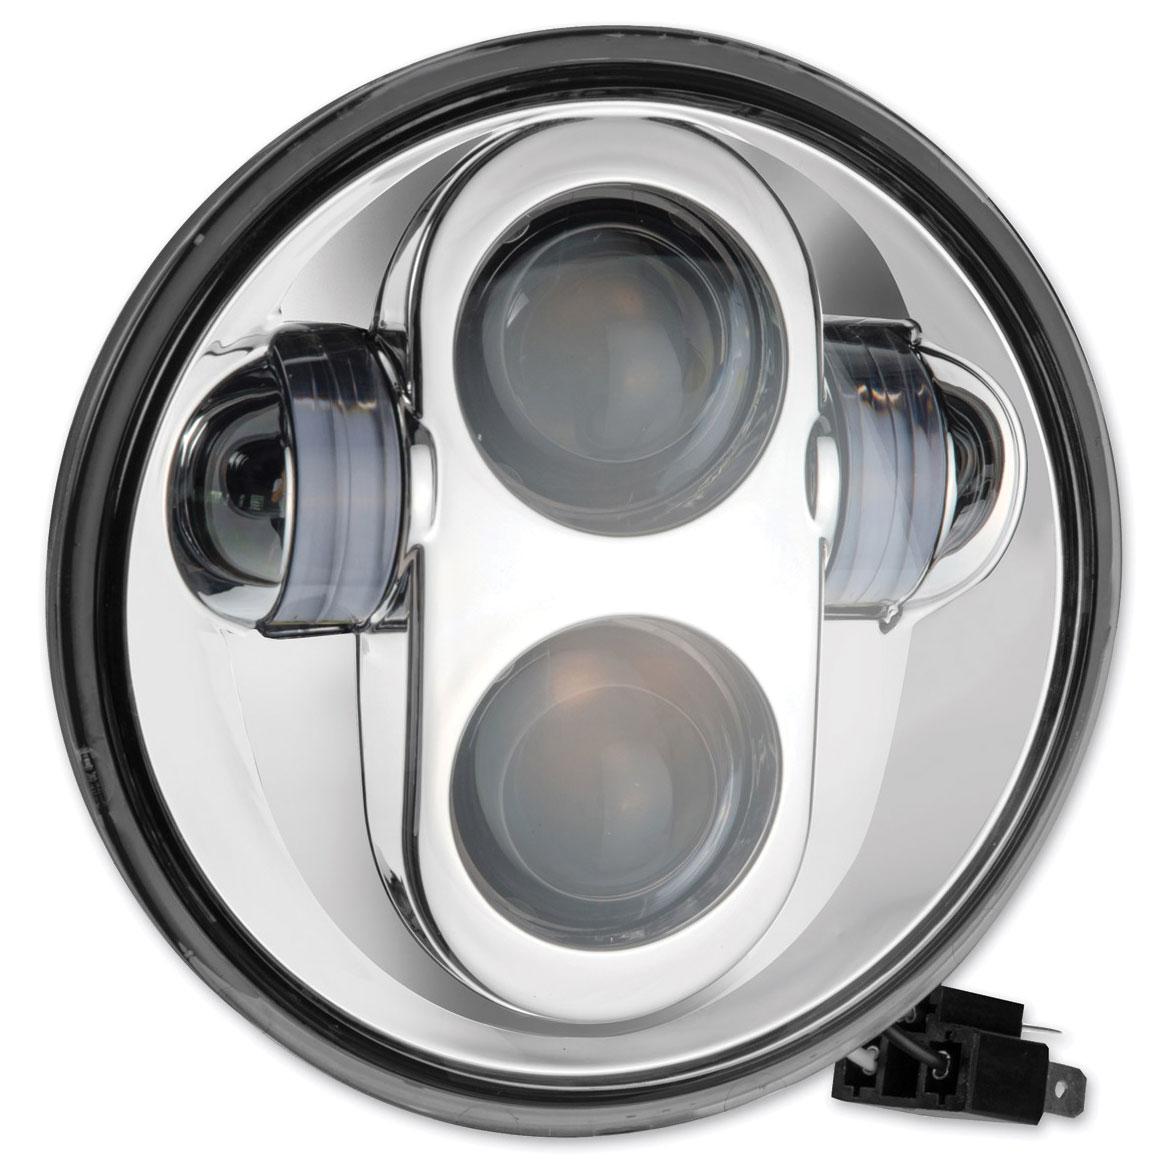 PathfinderLED 5-3/4″ LED Chrome Projector Headlight